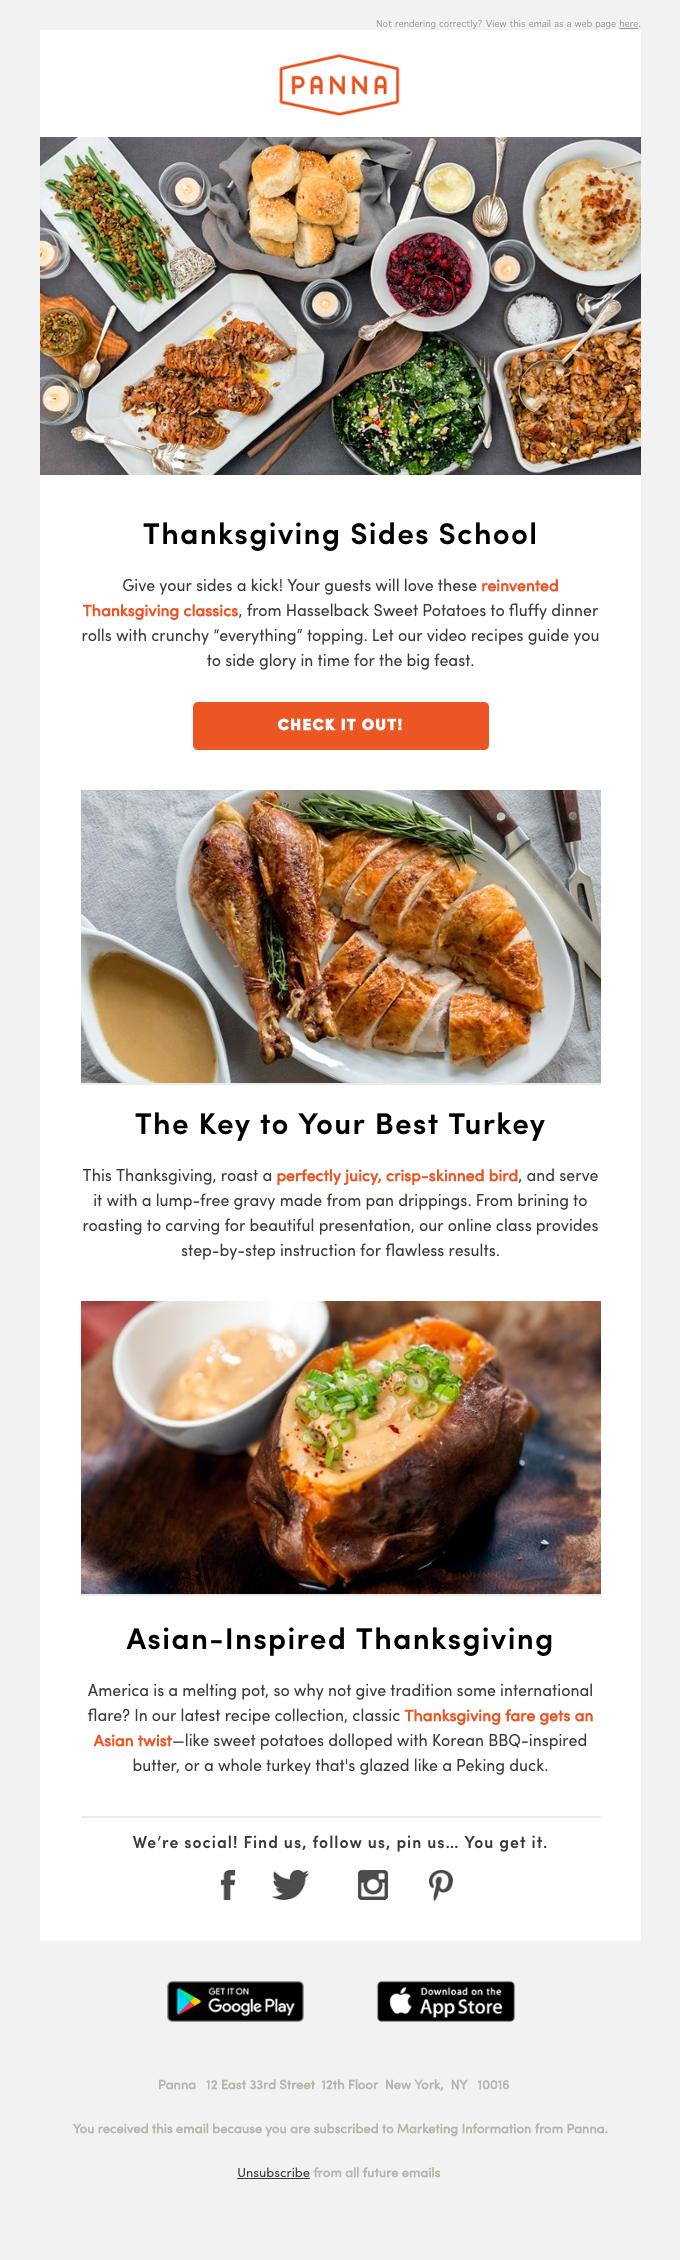 SO Many Sides: Bacon-Leek Stuffing + Luscious Gravy + Mashed Potatoes & More